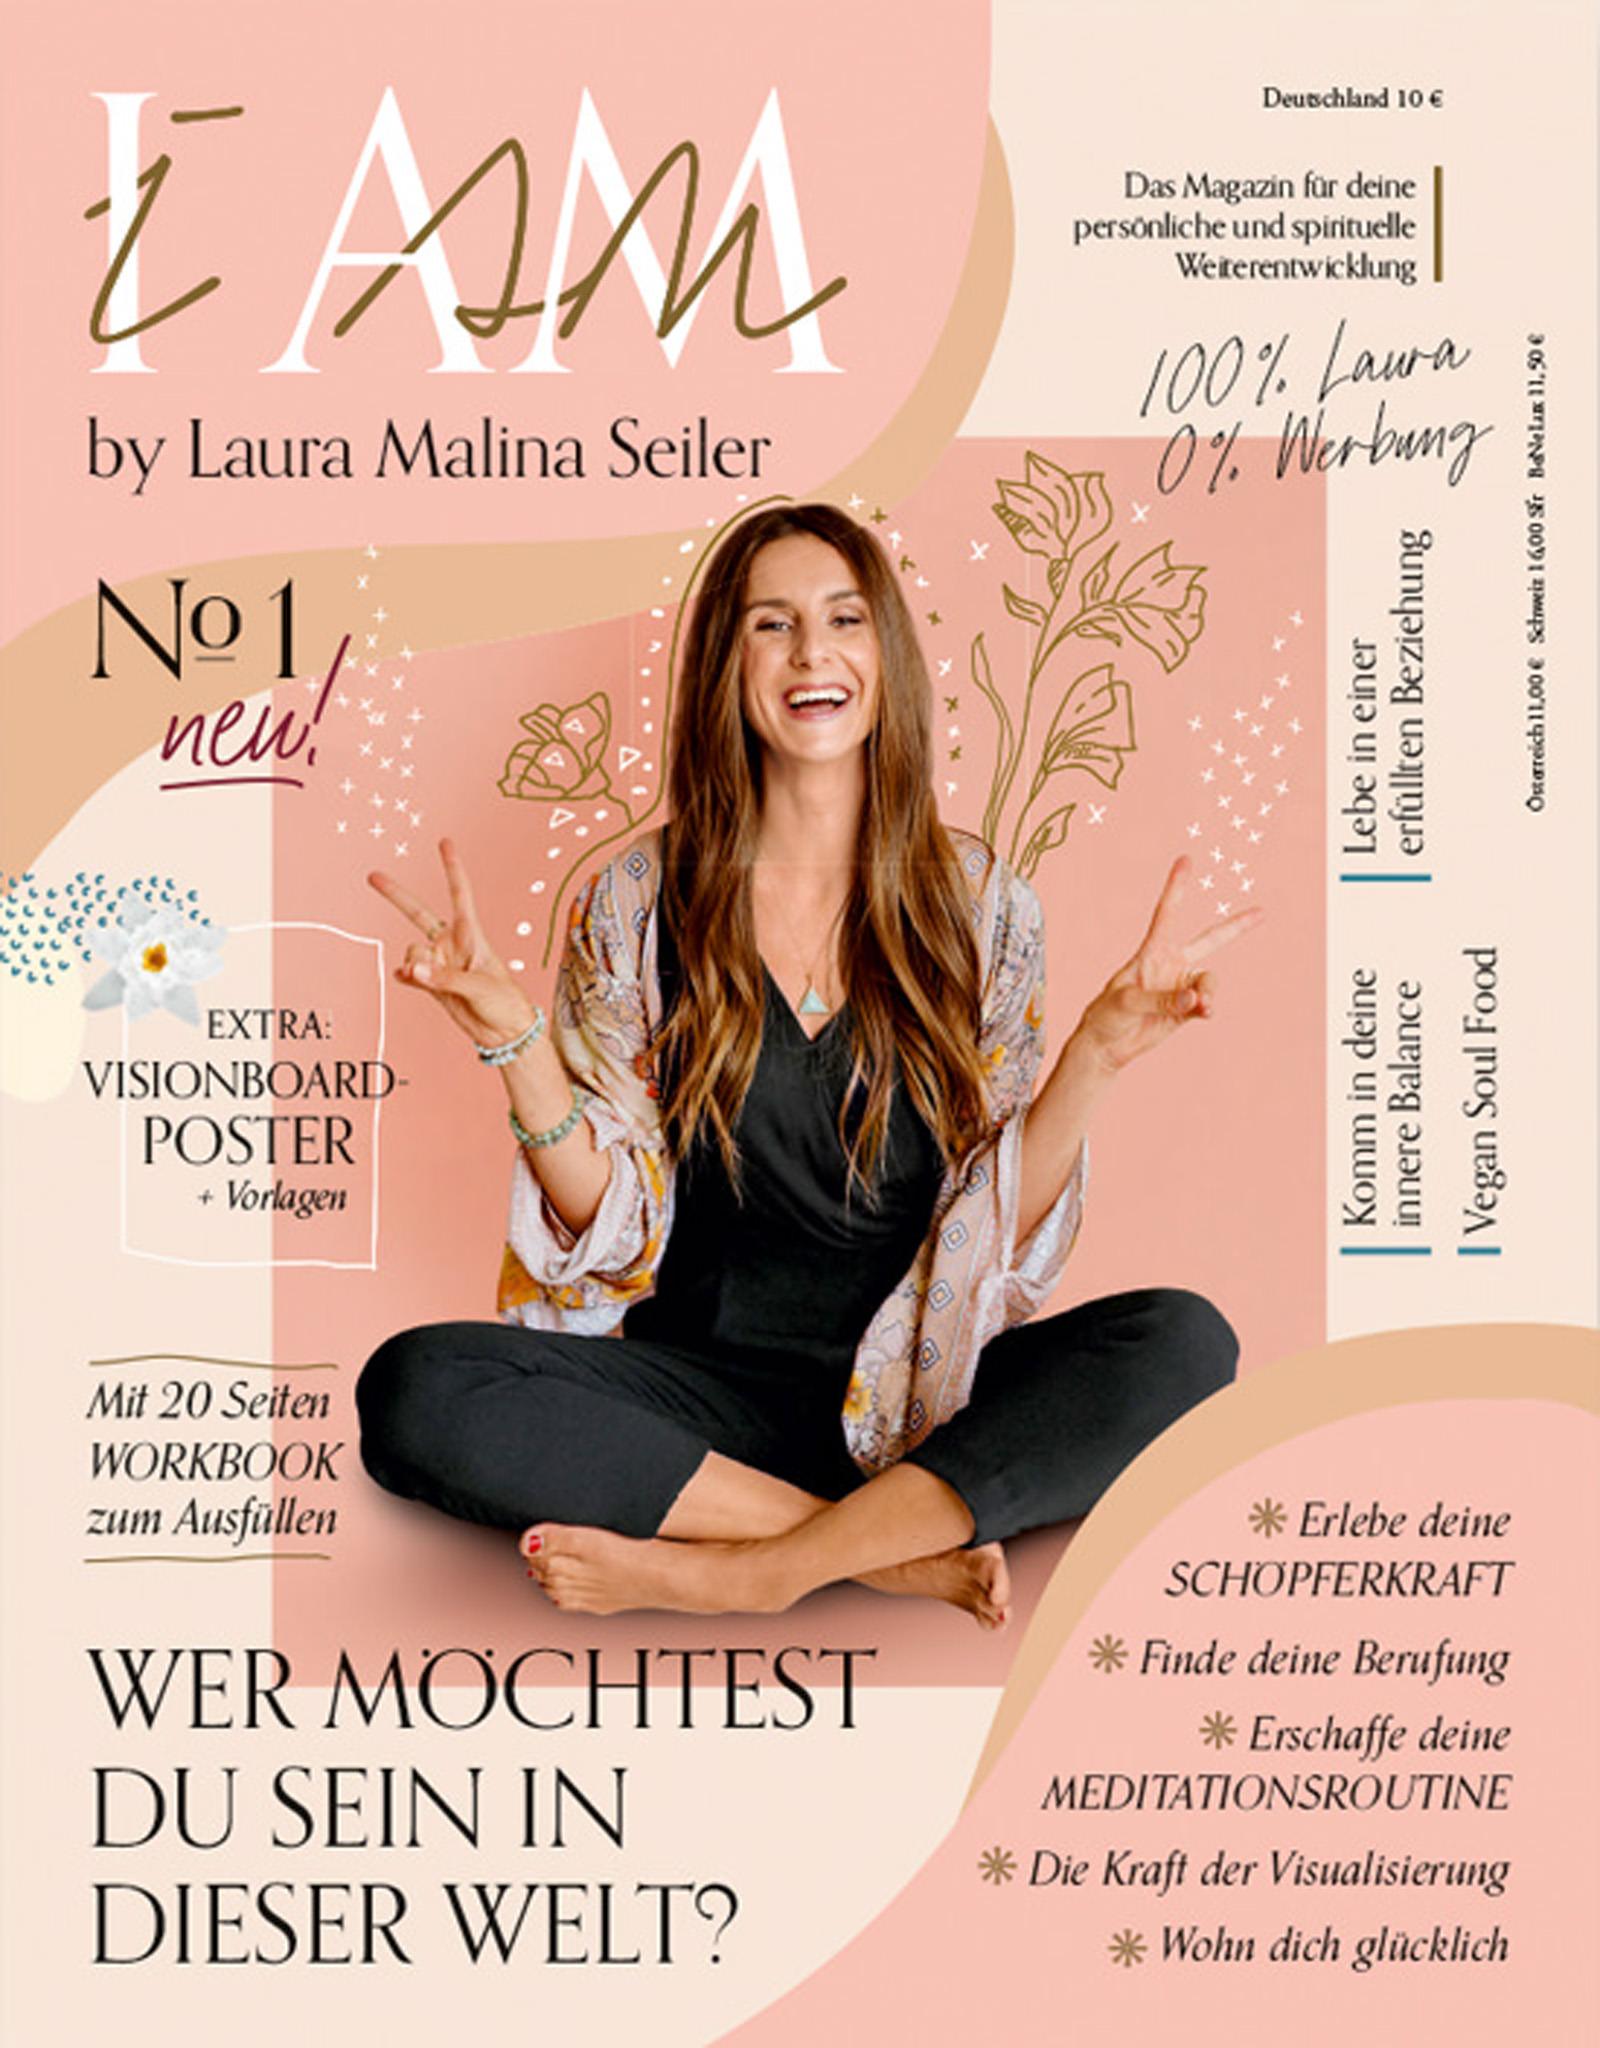 Laura Malina Seiler I AM Magazin Cover #1. Fotografiert von Farina Deutschmann